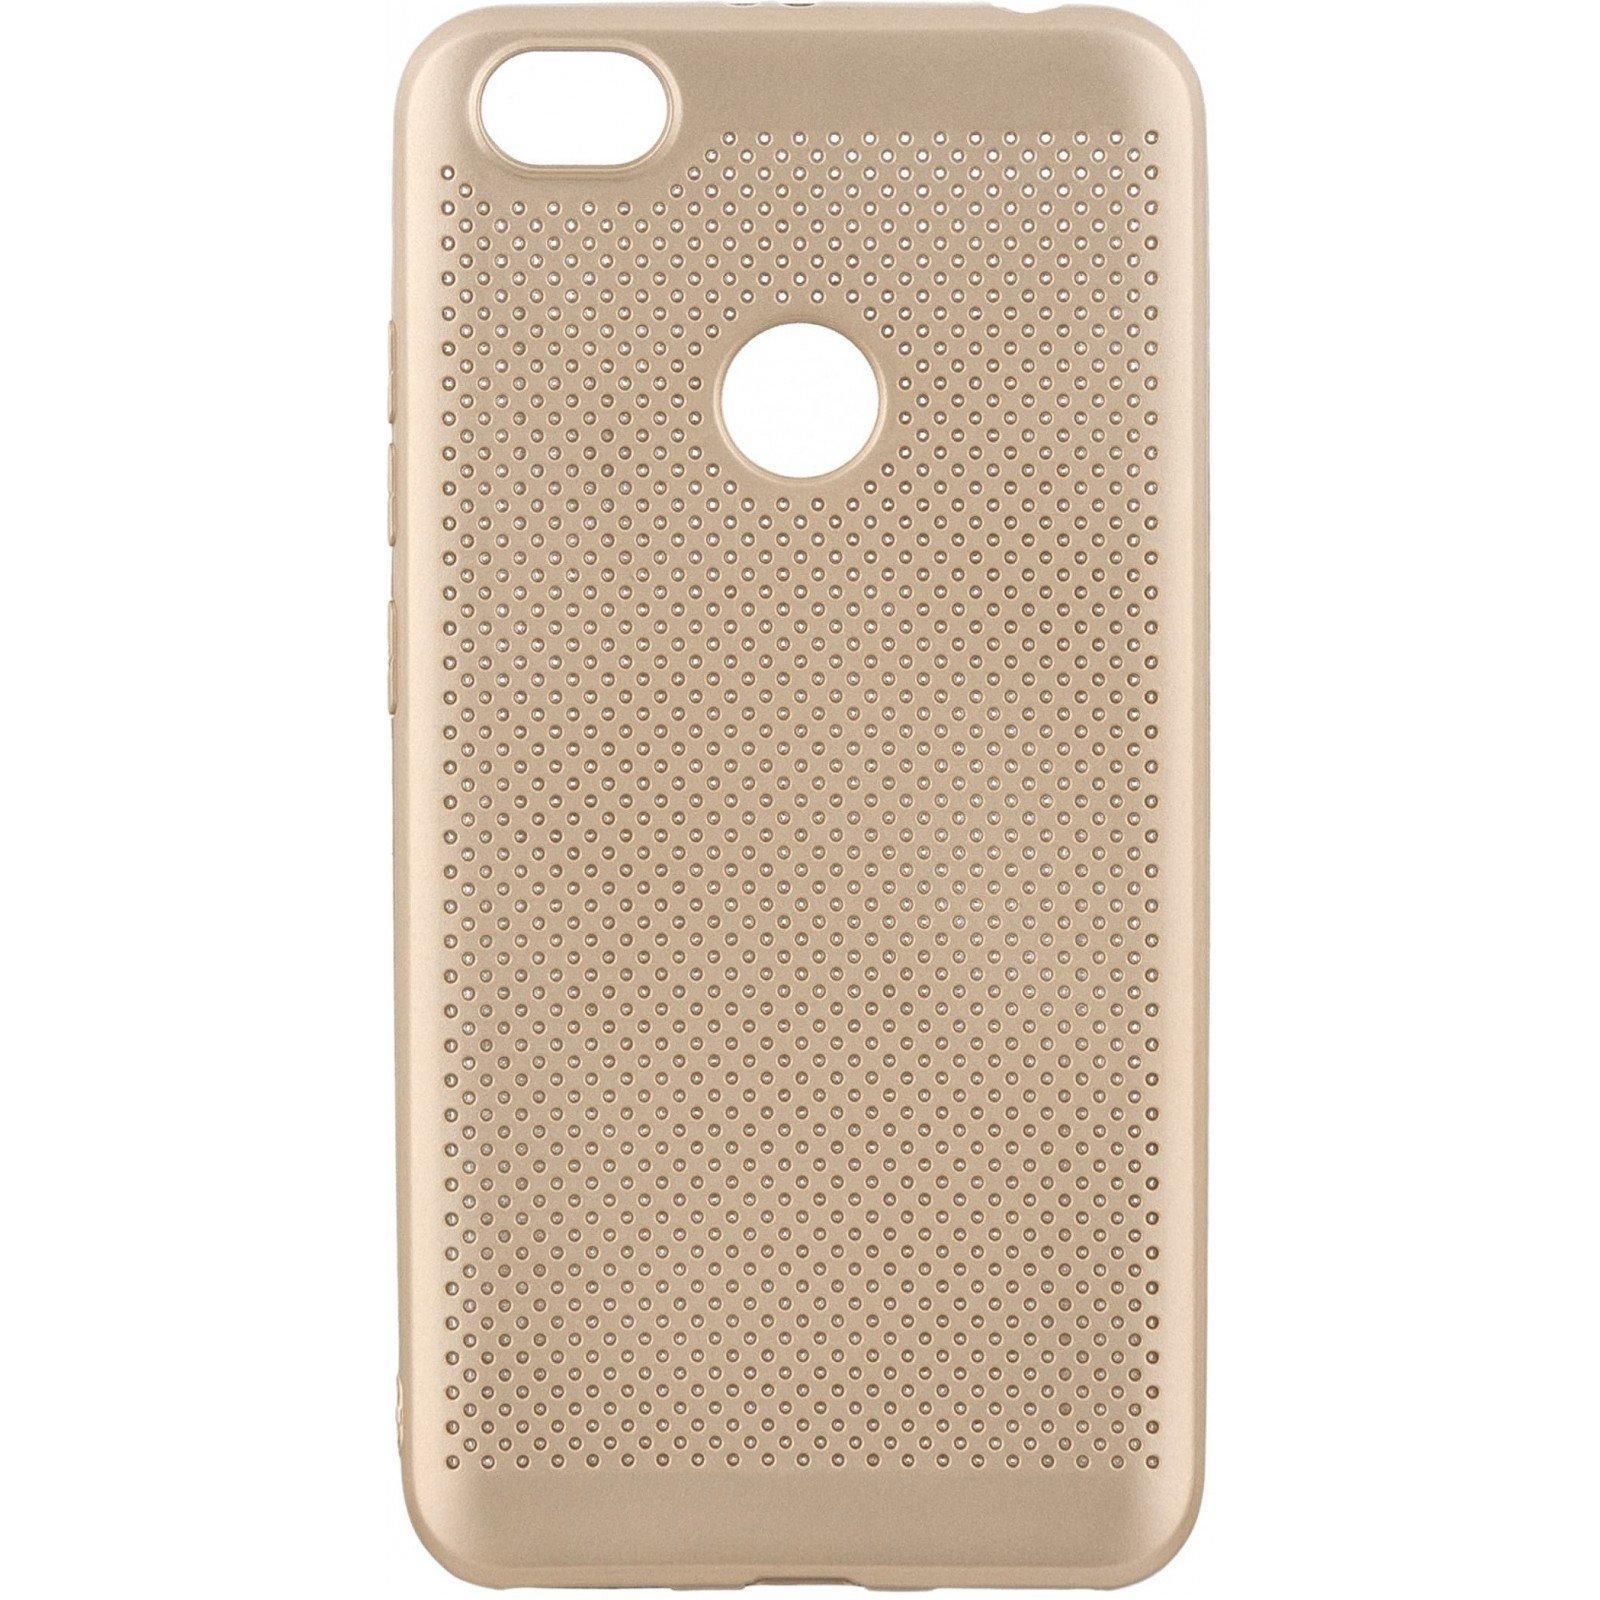 Чехол для моб. телефона MakeFuture TPU/Moon Case для Xiaomi Redmi Note 5A Prime Gold (MCM-XRN5APGD) изображение 4